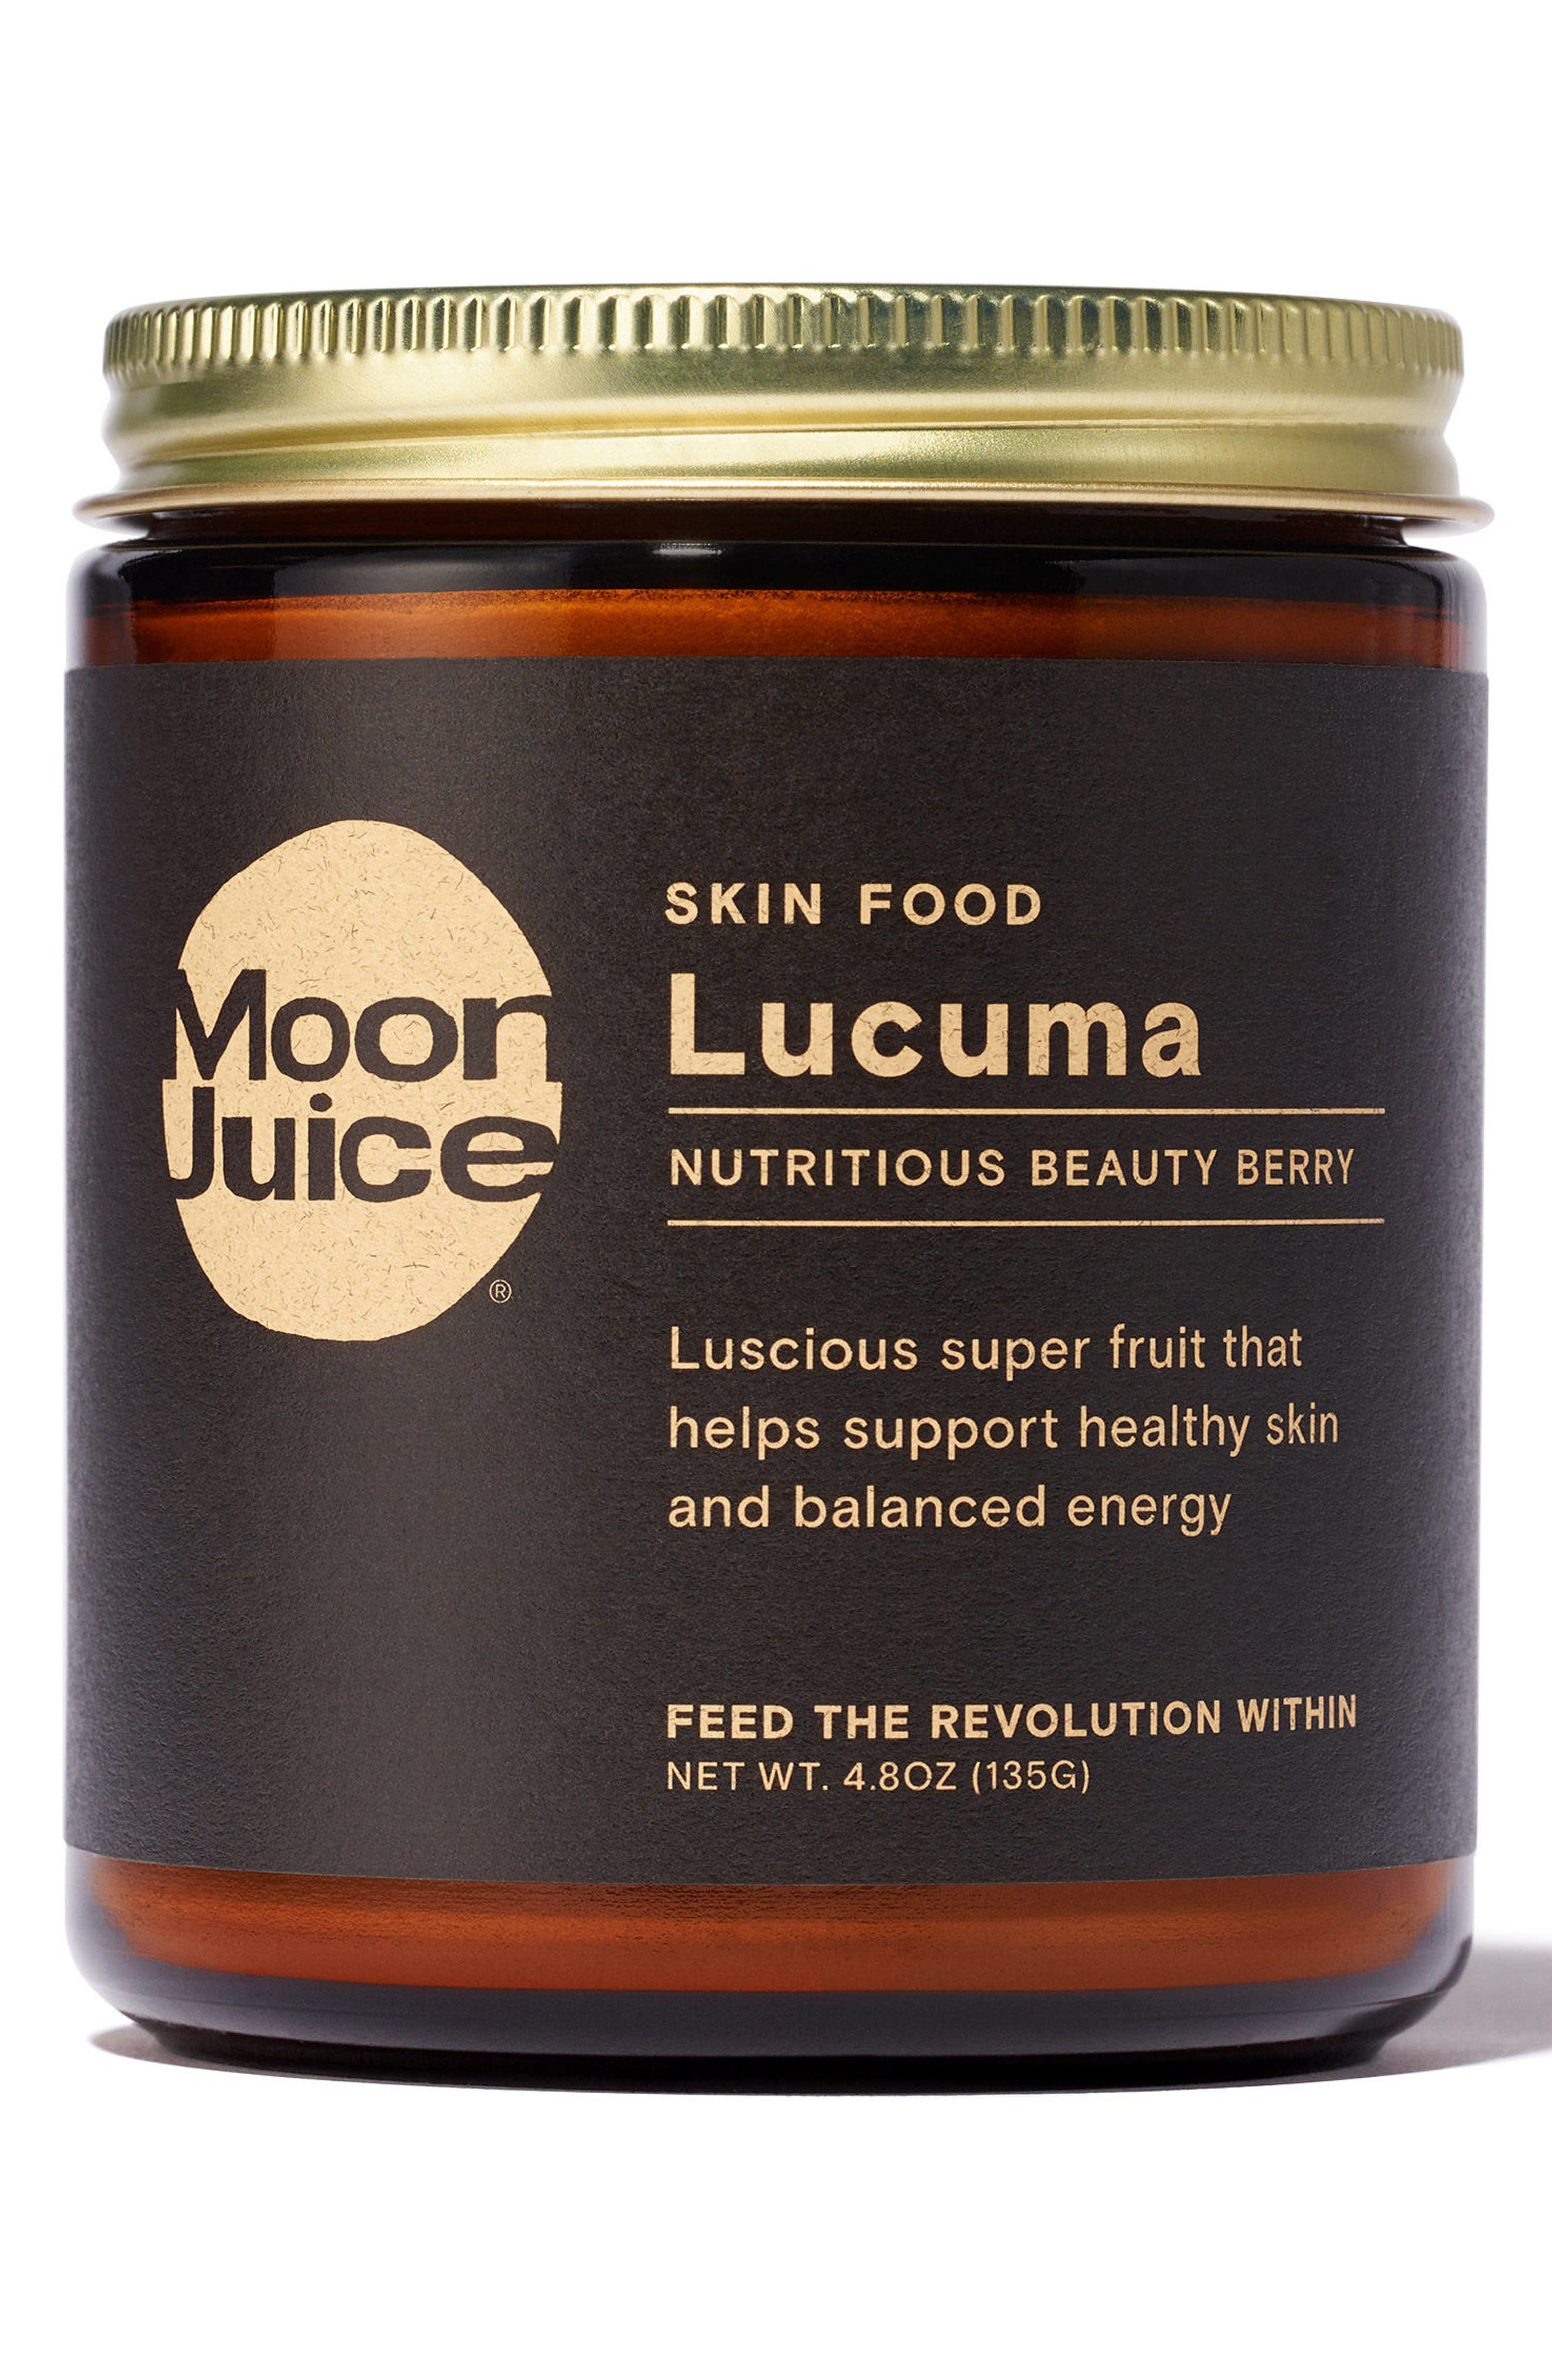 MOON JUICE Lucuma Nutritious Beauty Berry Powder, Main, color, 000